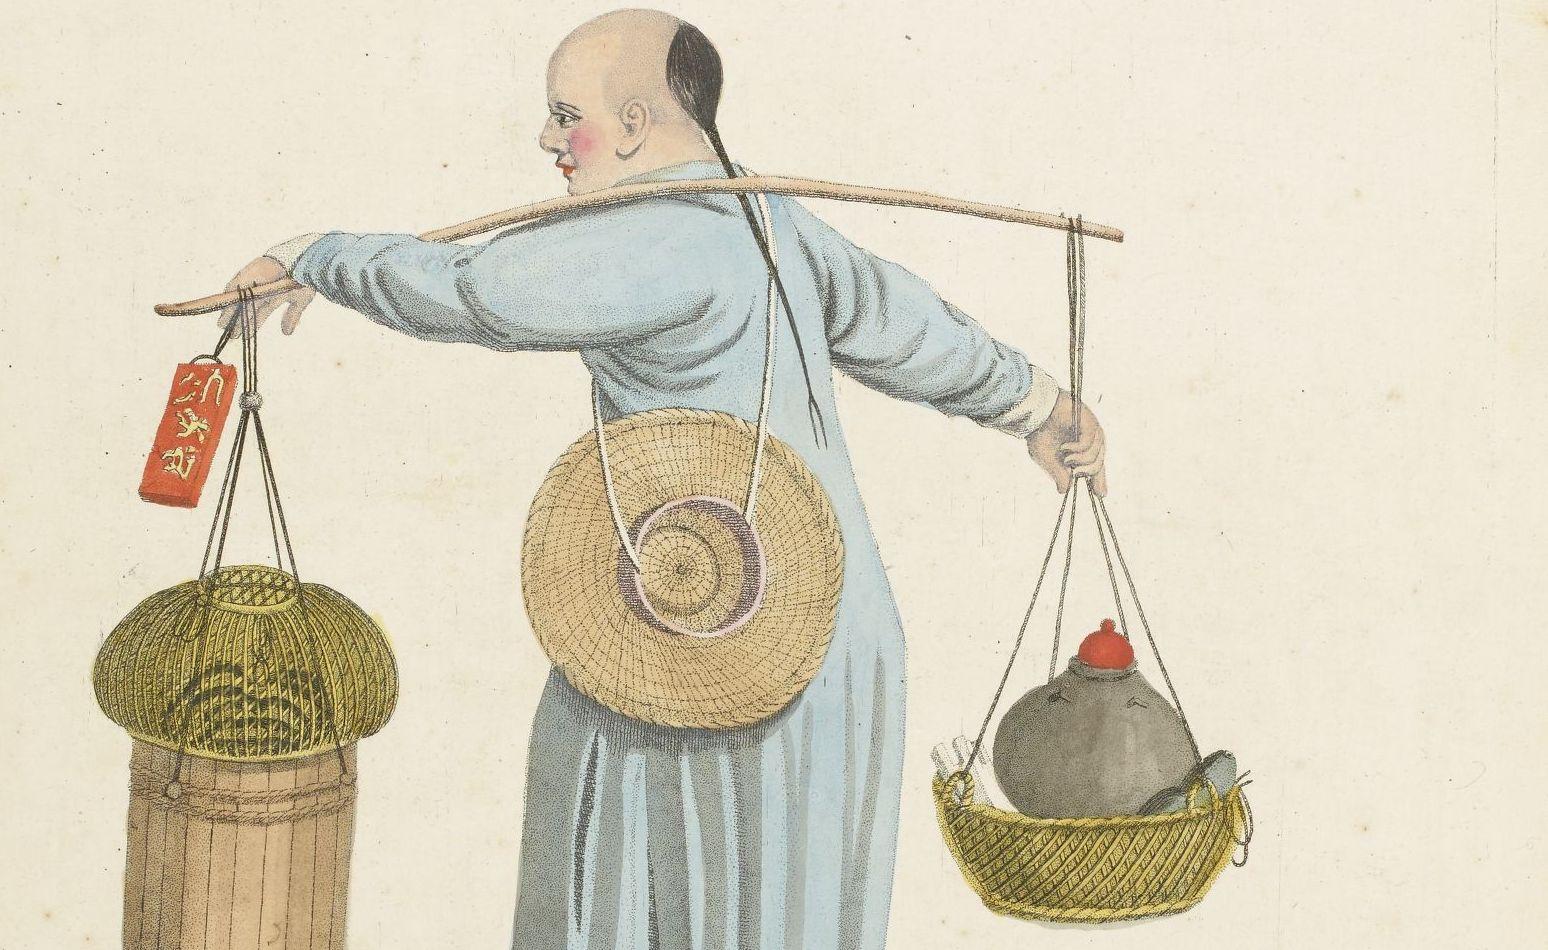 Coutumes de la Chine http://gallica.bnf.fr/ark:/12148/btv1b84965716/f139.item